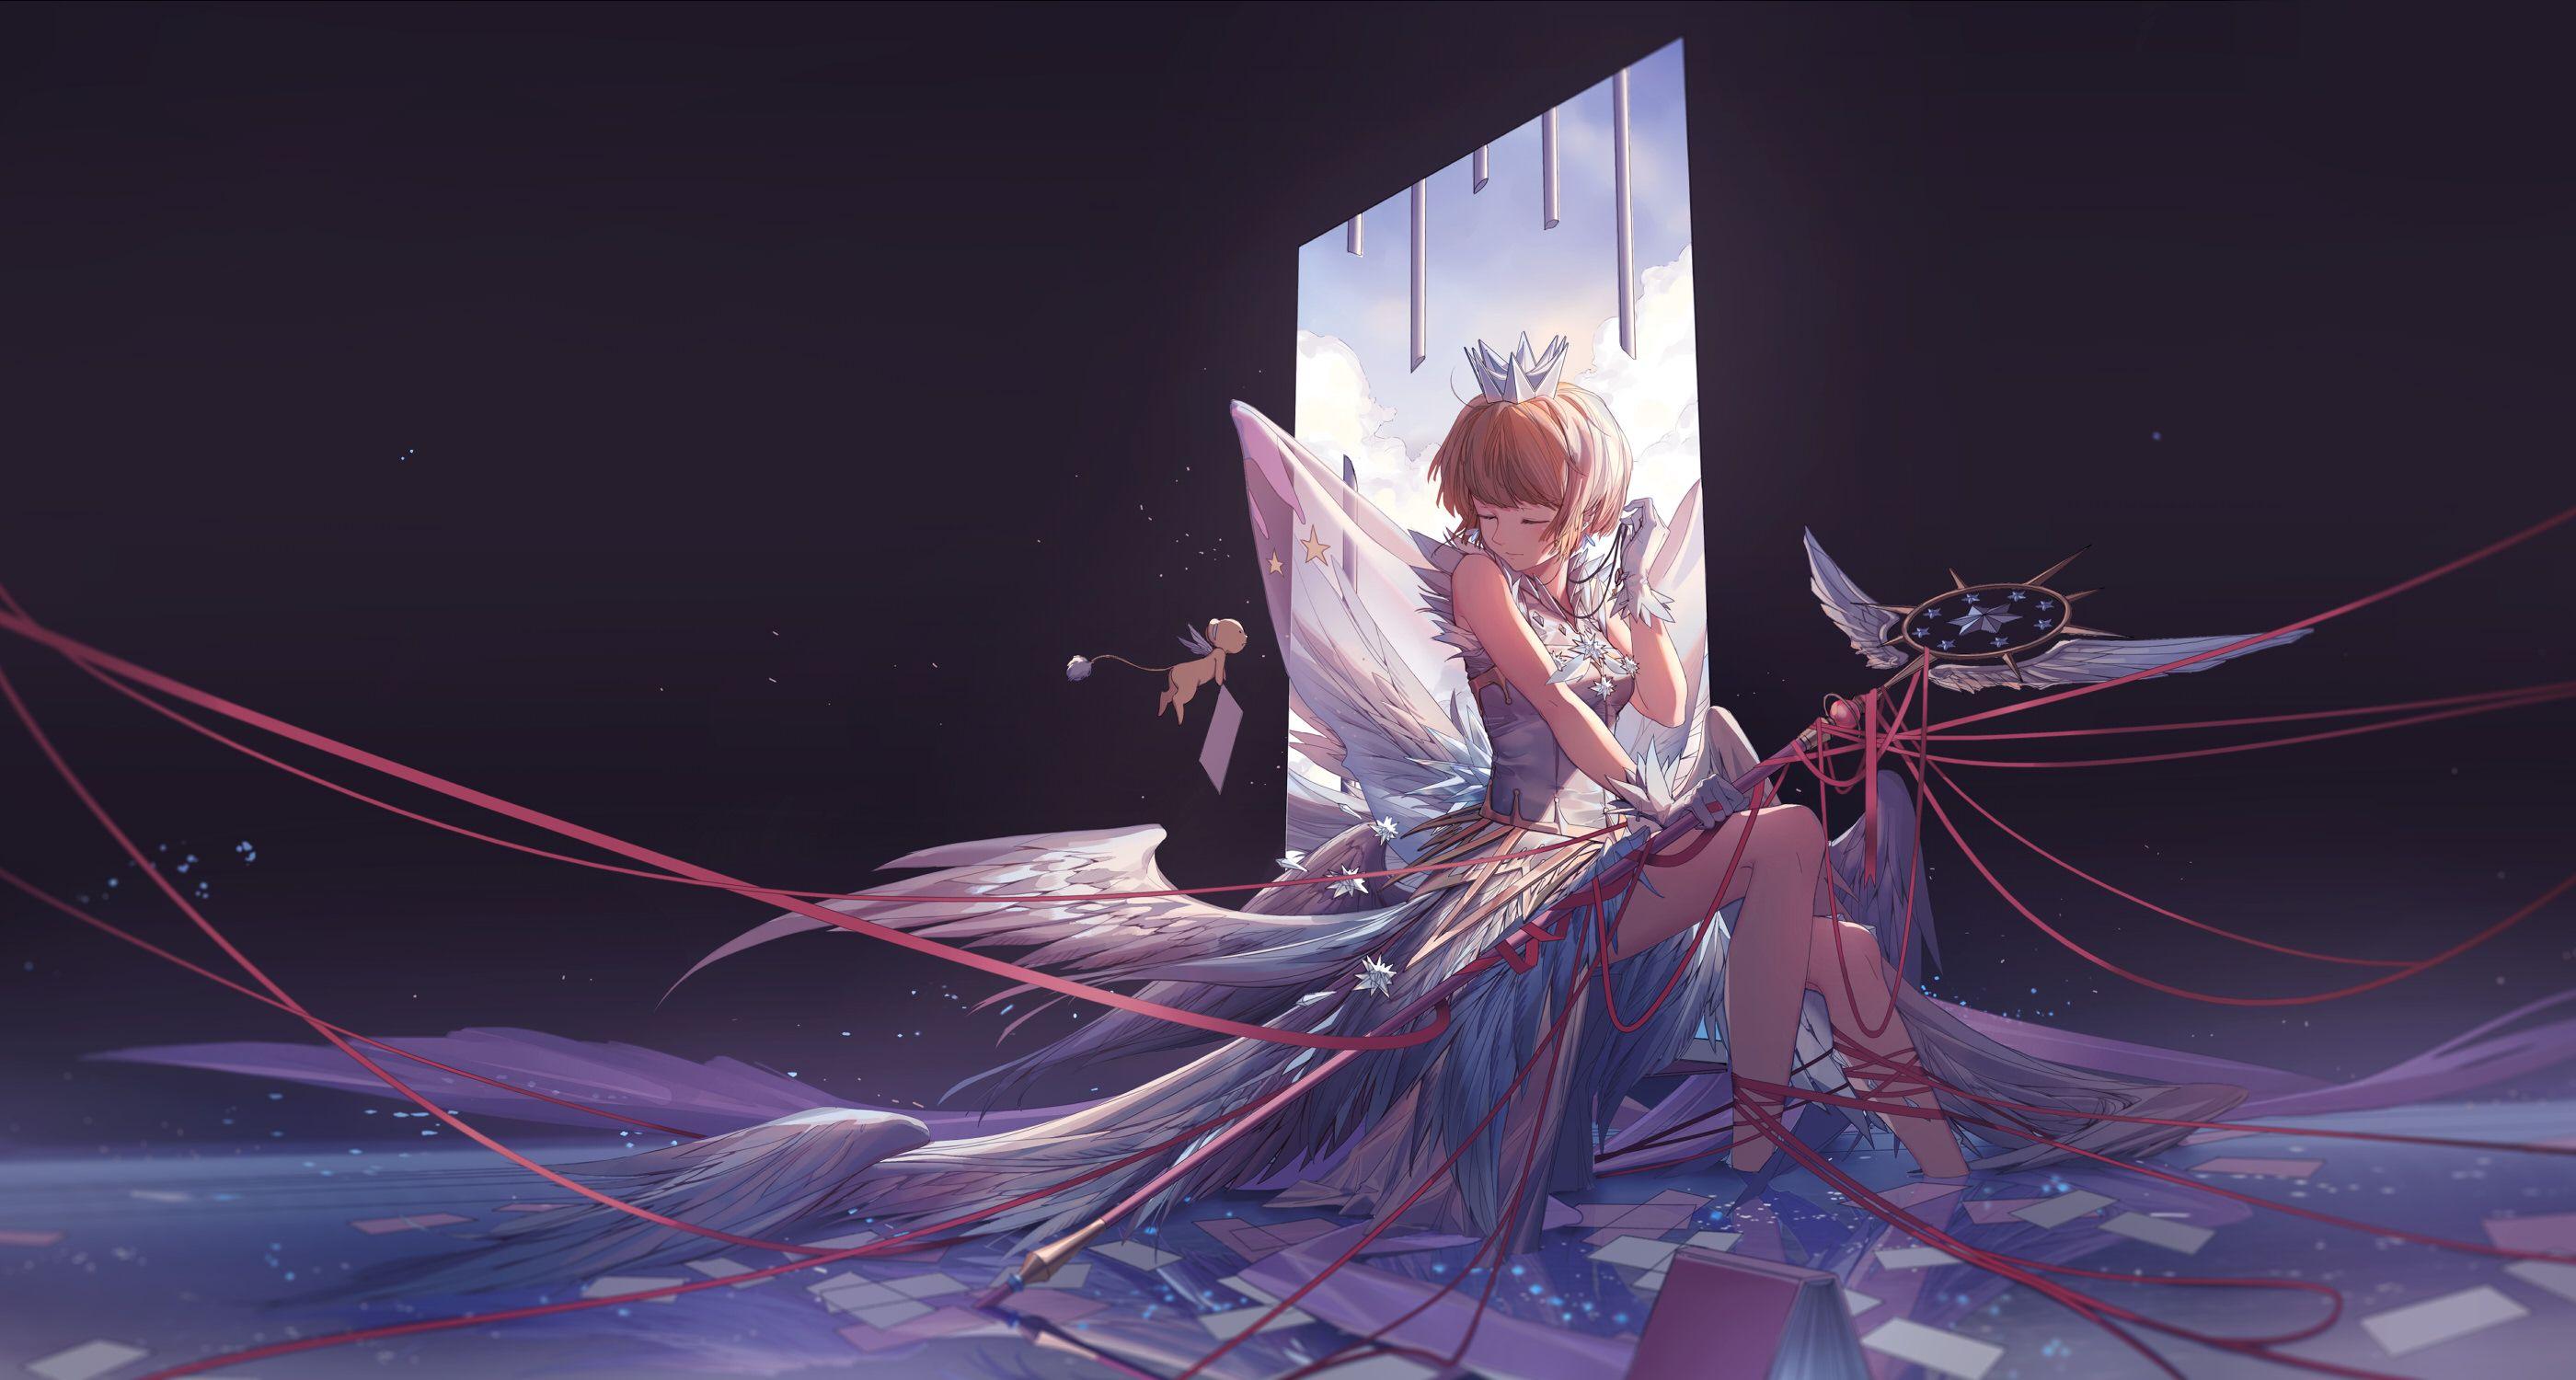 High Definition Mobile Phone And Desktop Wallpapers Cardcaptor Sakura Sakura Sakura Art